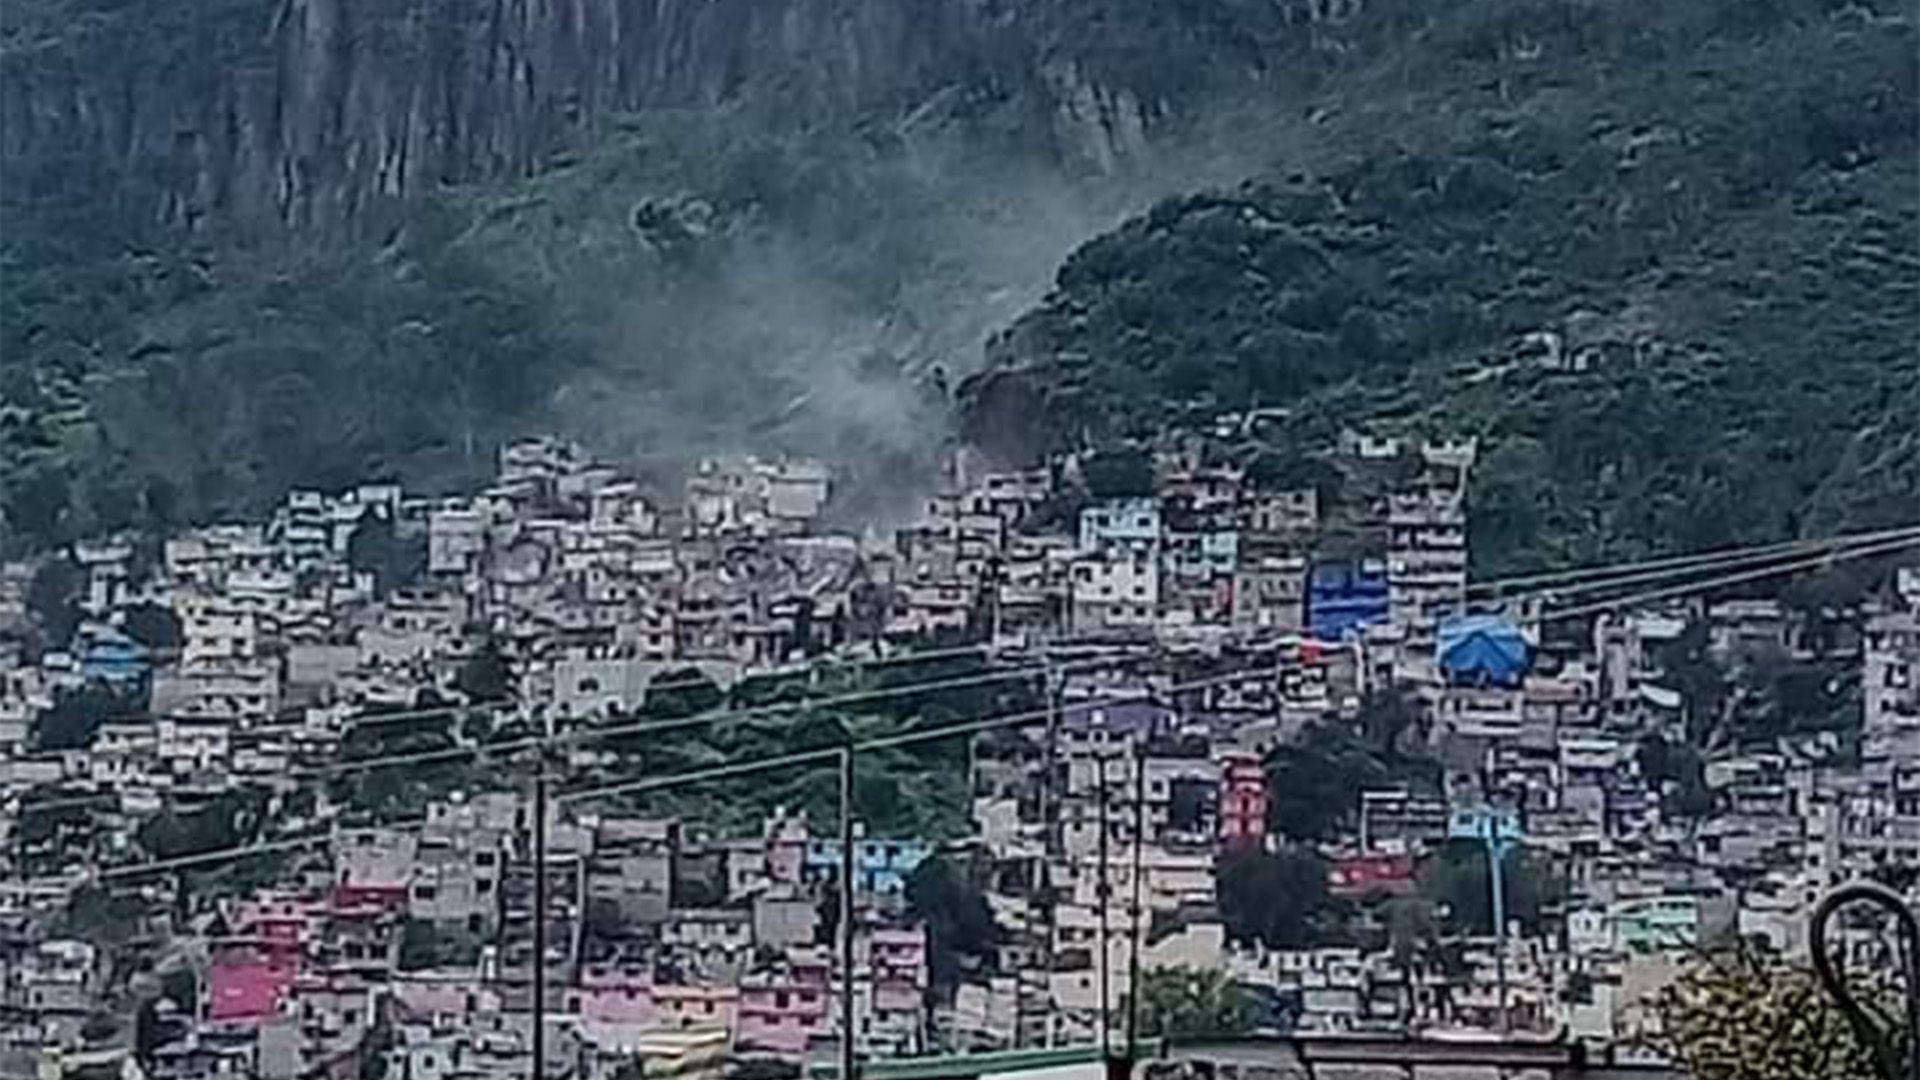 desgajó cerro de Chiquihuite en la CDMX (Foto: Twitter@cdmx_diario)